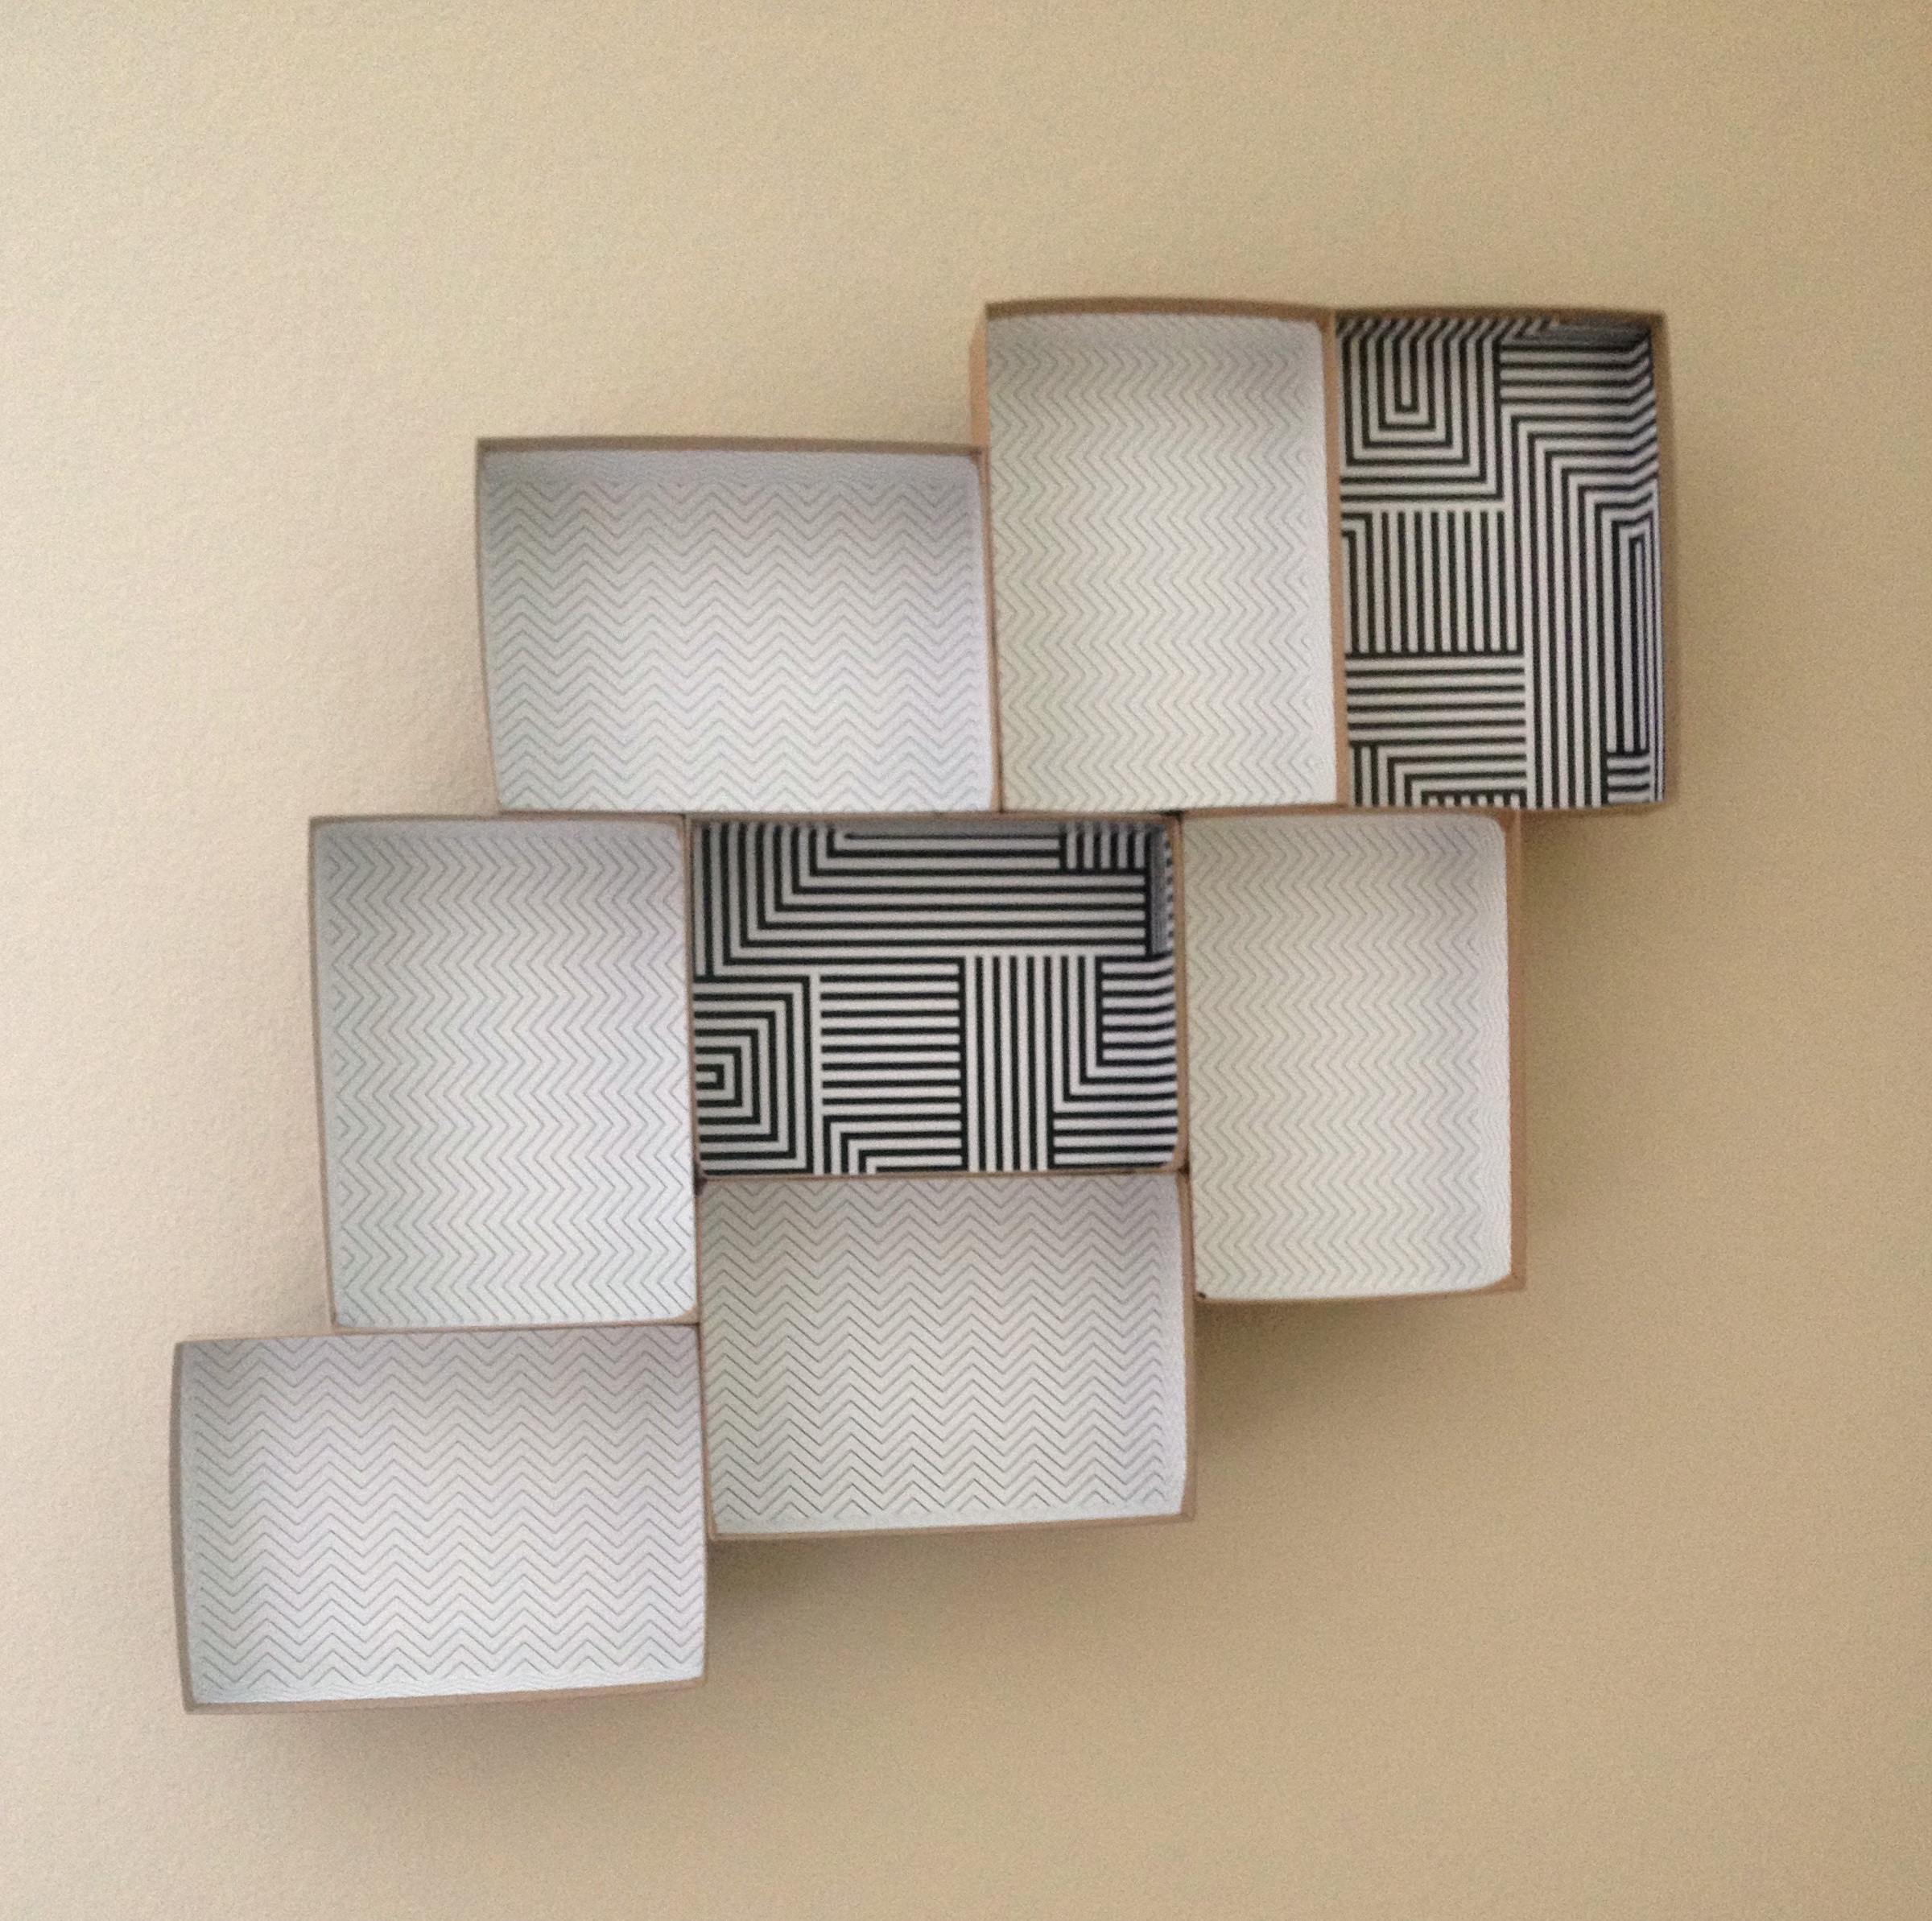 Diy Box Wall Shelves